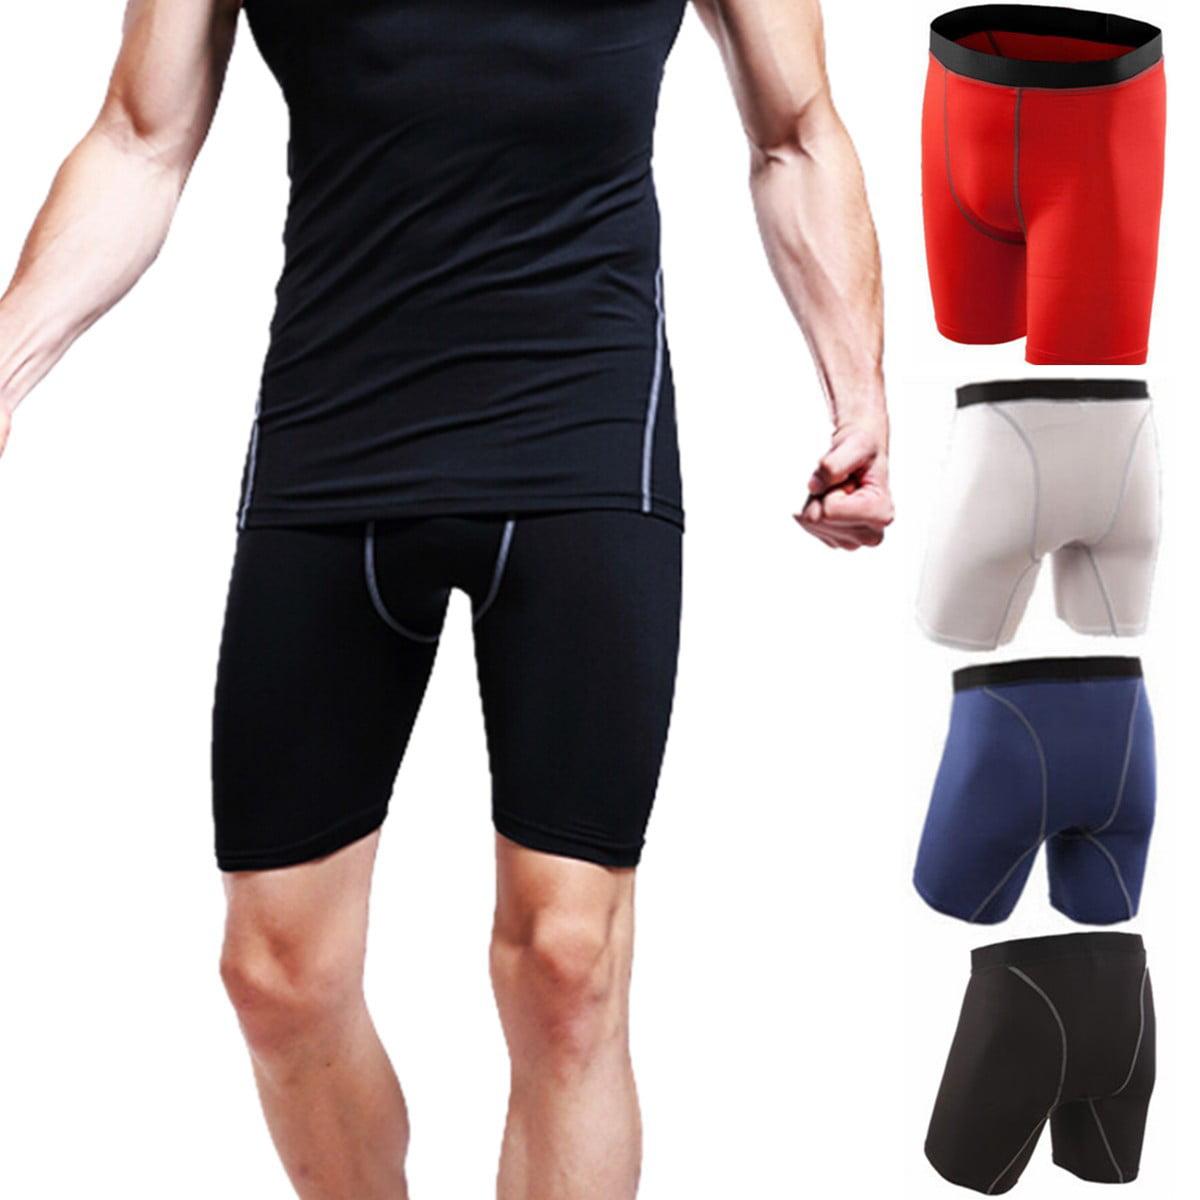 Base Layer Men's Compression Skin Tights Sports Shorts Short Pants Running Gym Yoga Sport Shorts Pants, S-XXL